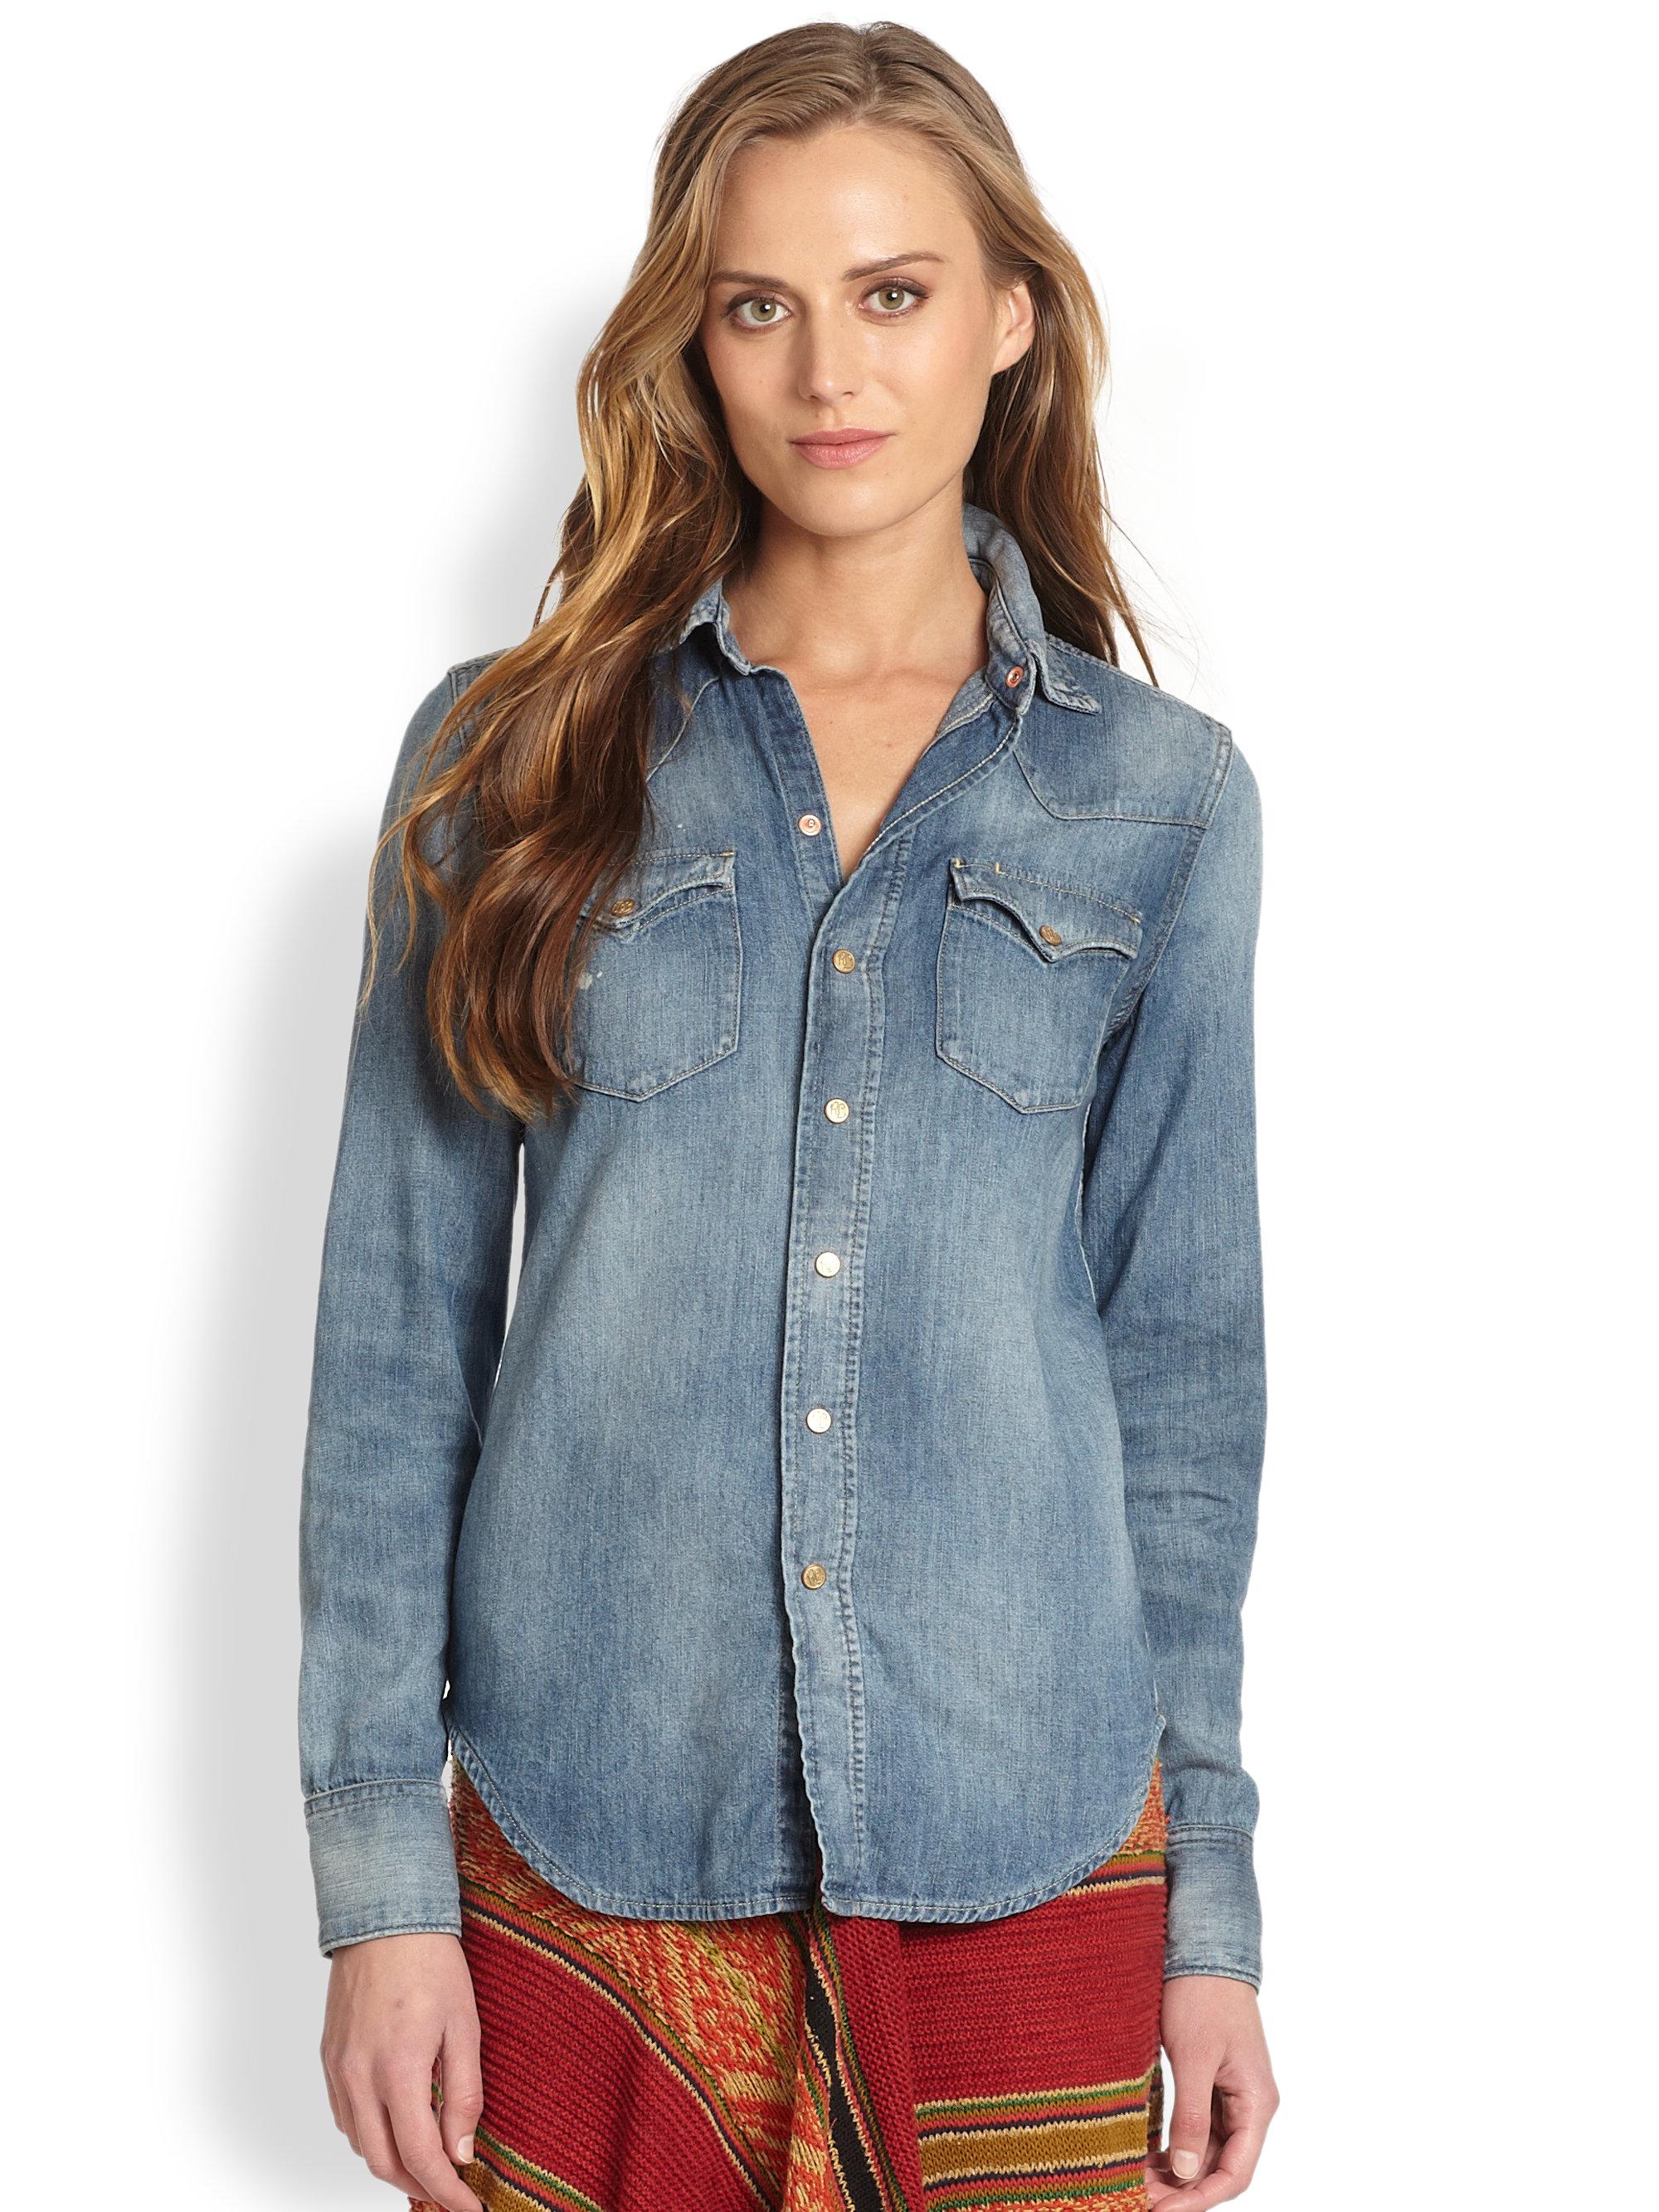 7d5f079a ... canada lyst ralph lauren blue label western chambray shirt in blue  354ff d3988